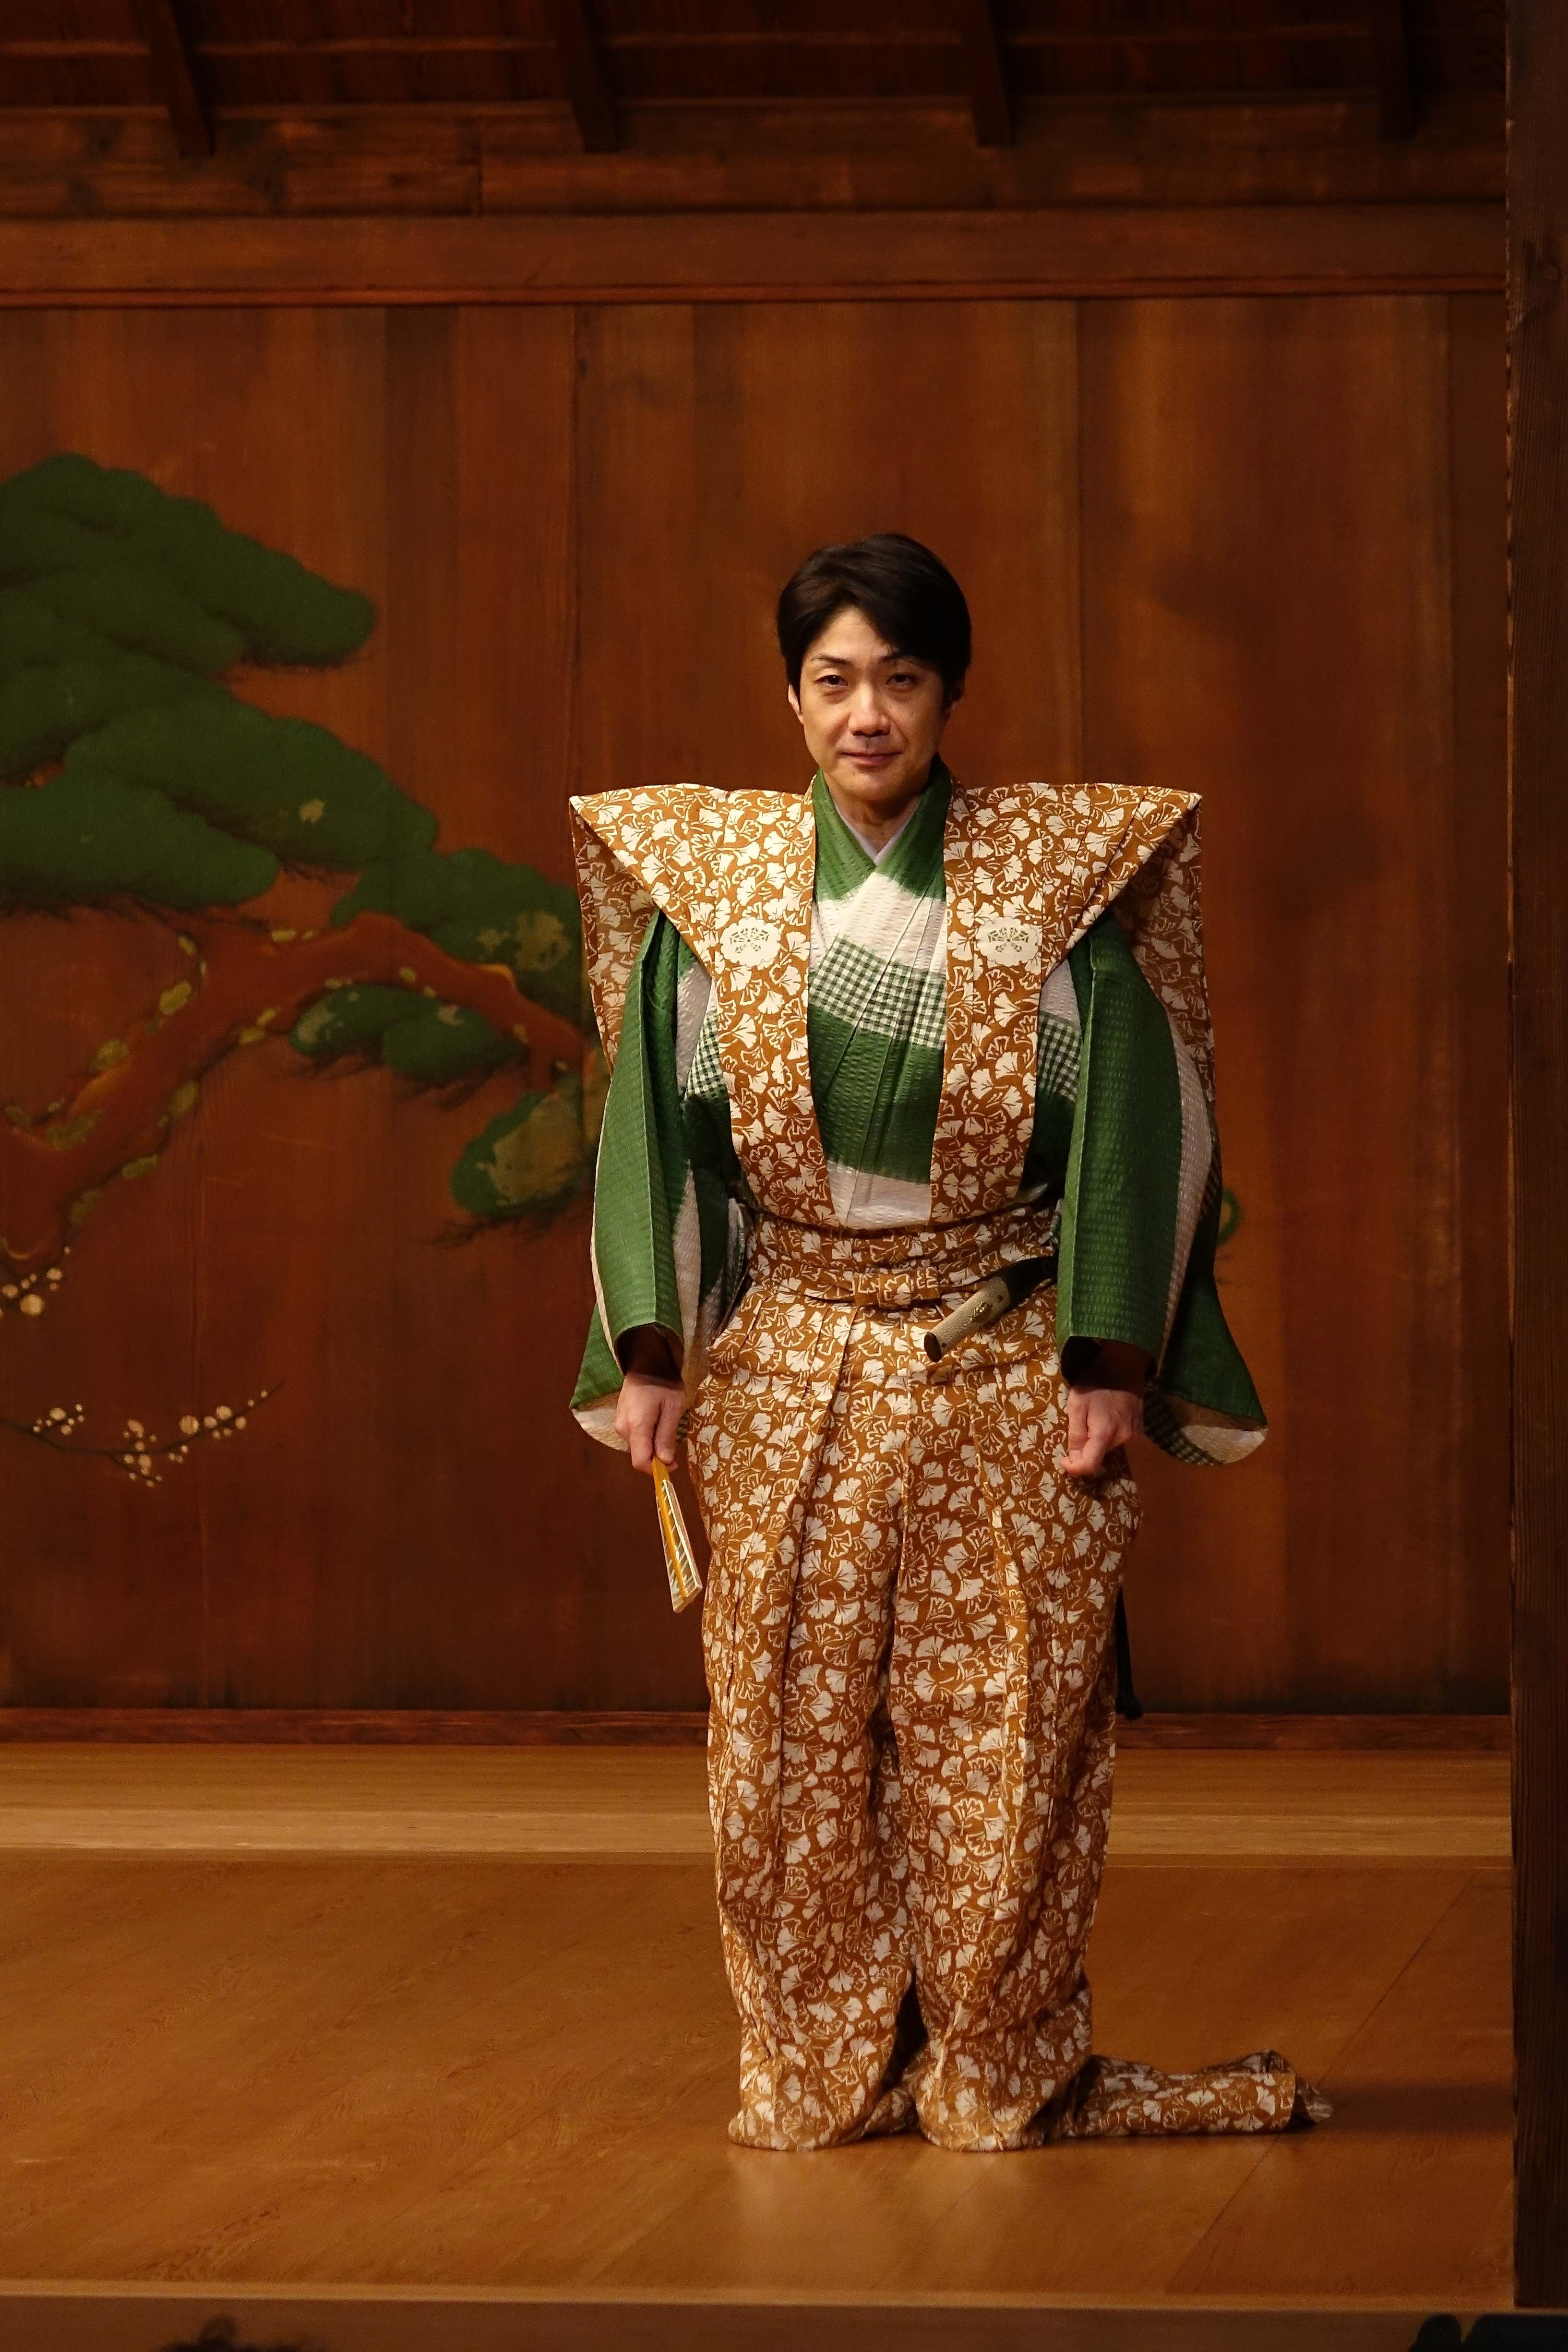 "Kanta Nakamori x曼西·野村(Mansai Nomura)""知識與樂趣!能和Kyogen的世界"""